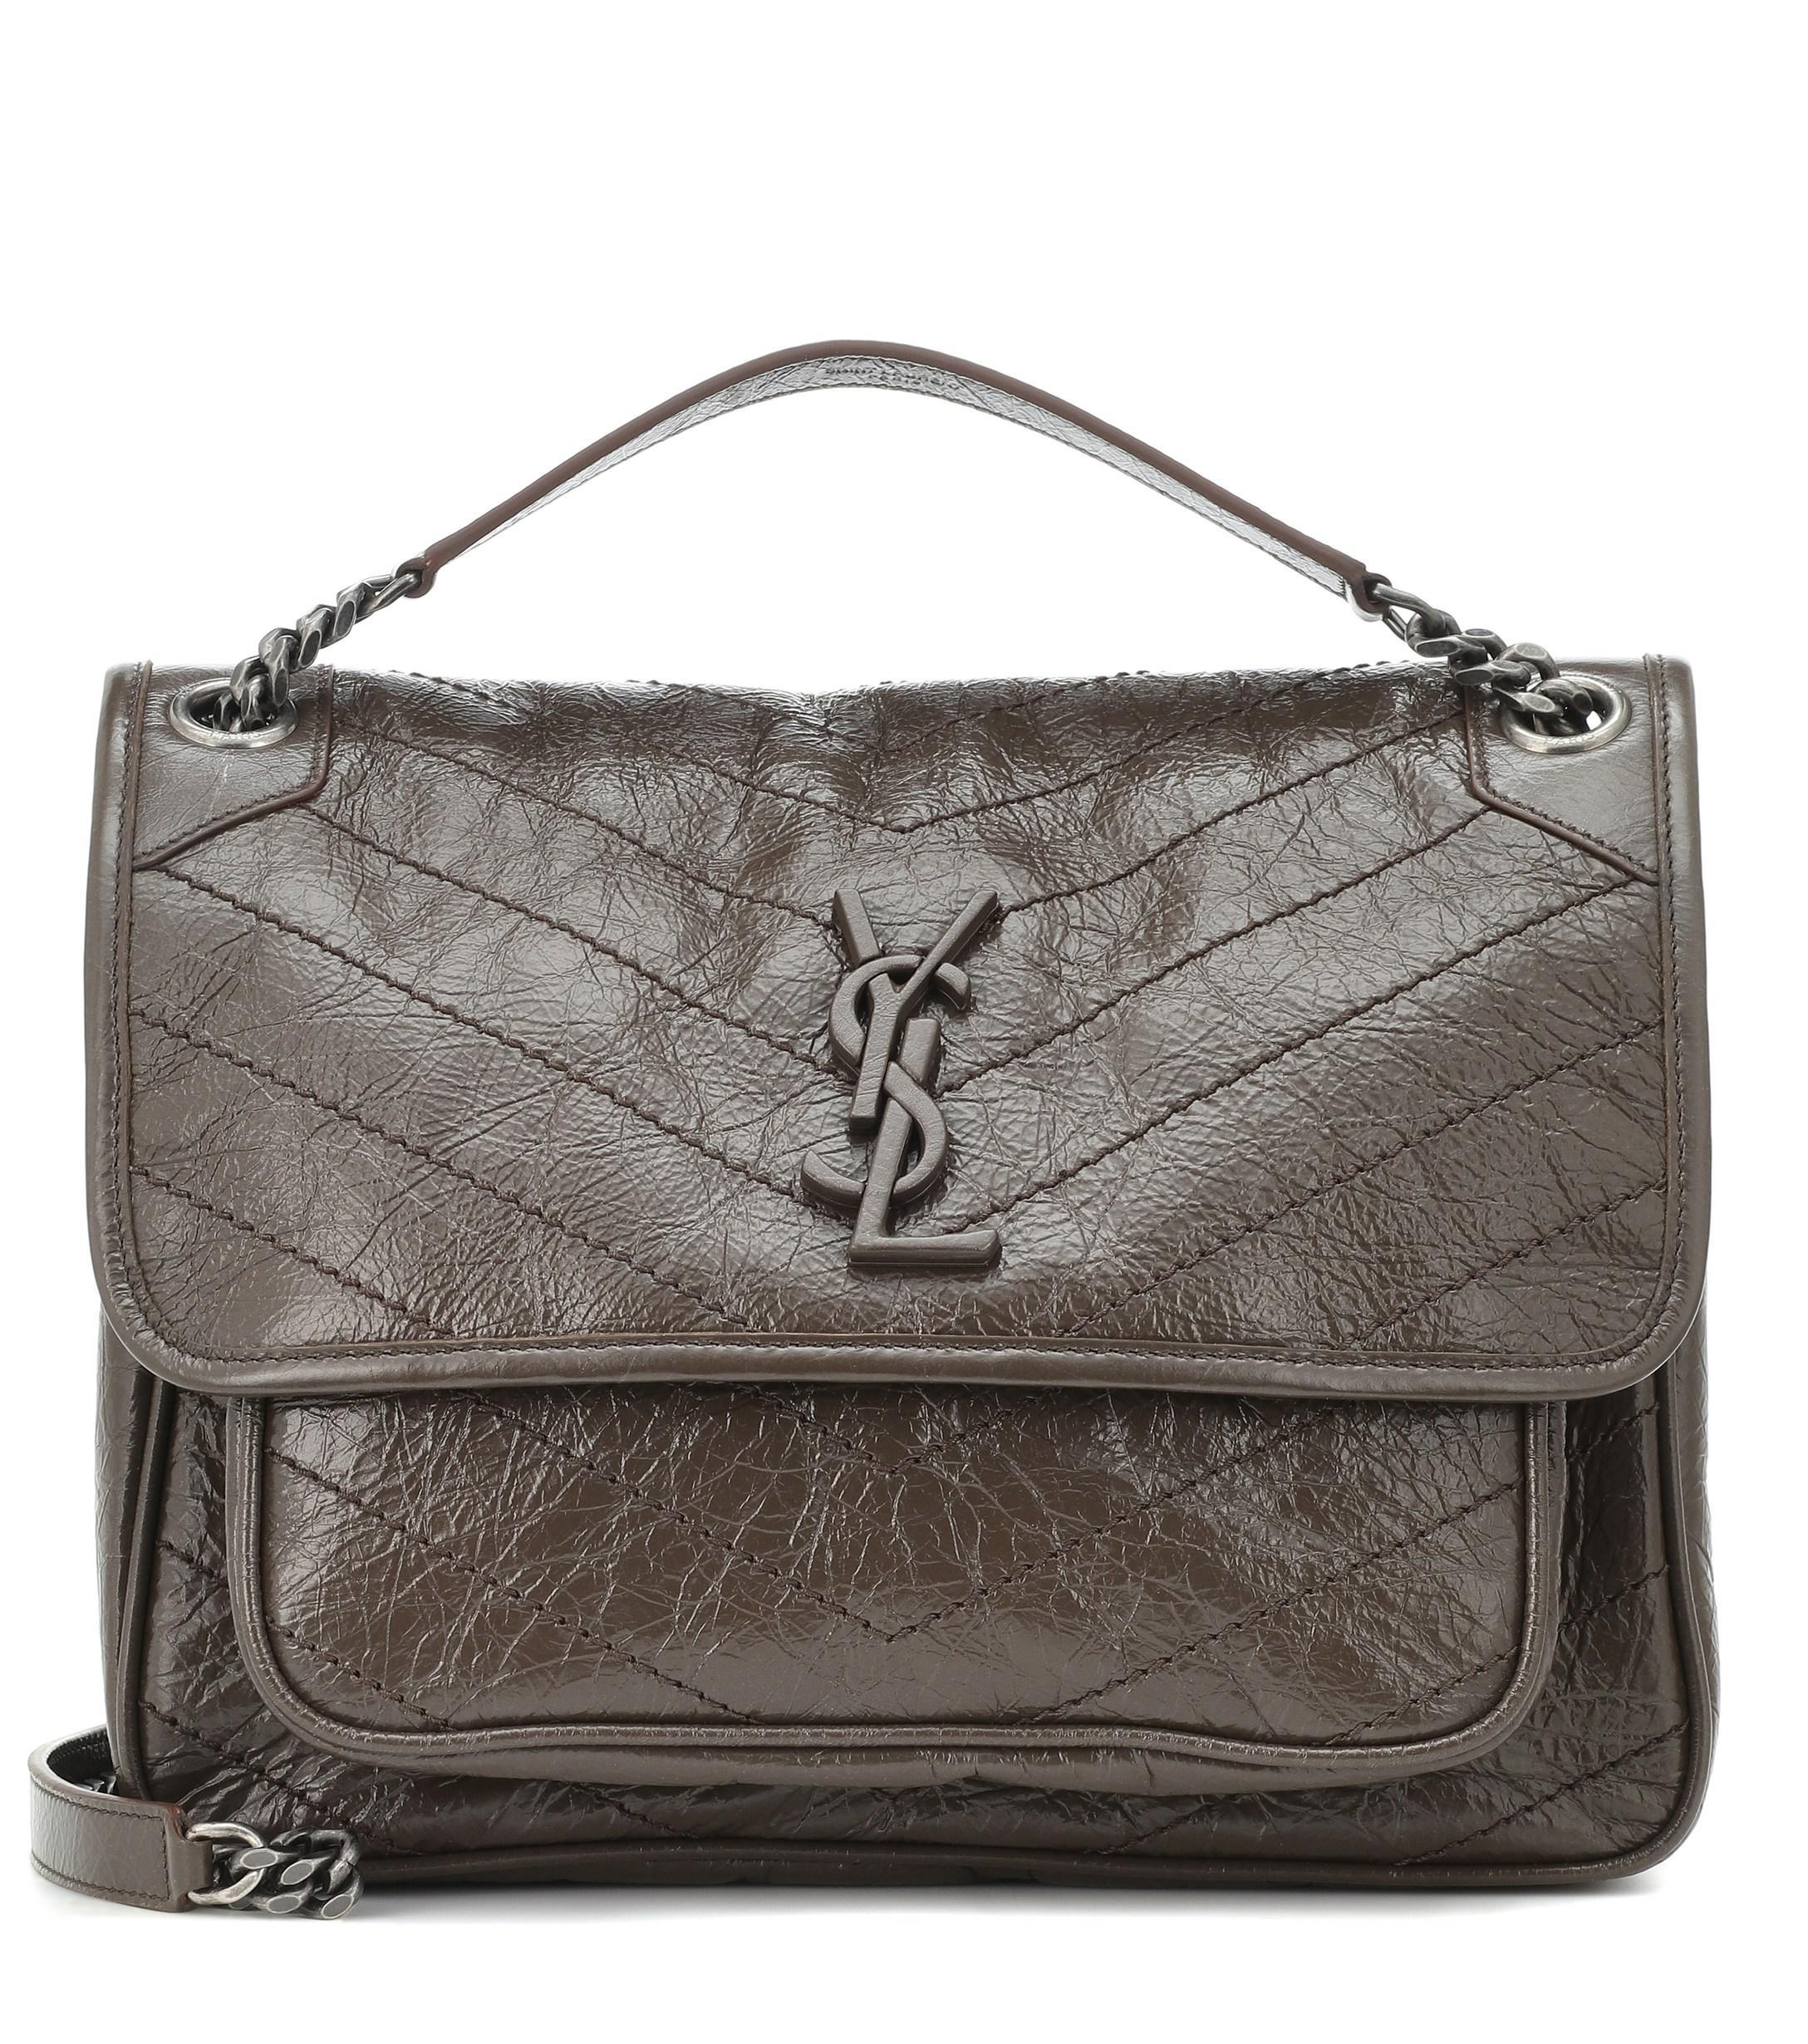 916dae7fe9d8 Saint Laurent Medium Niki Leather Shoulder Bag in Brown - Lyst